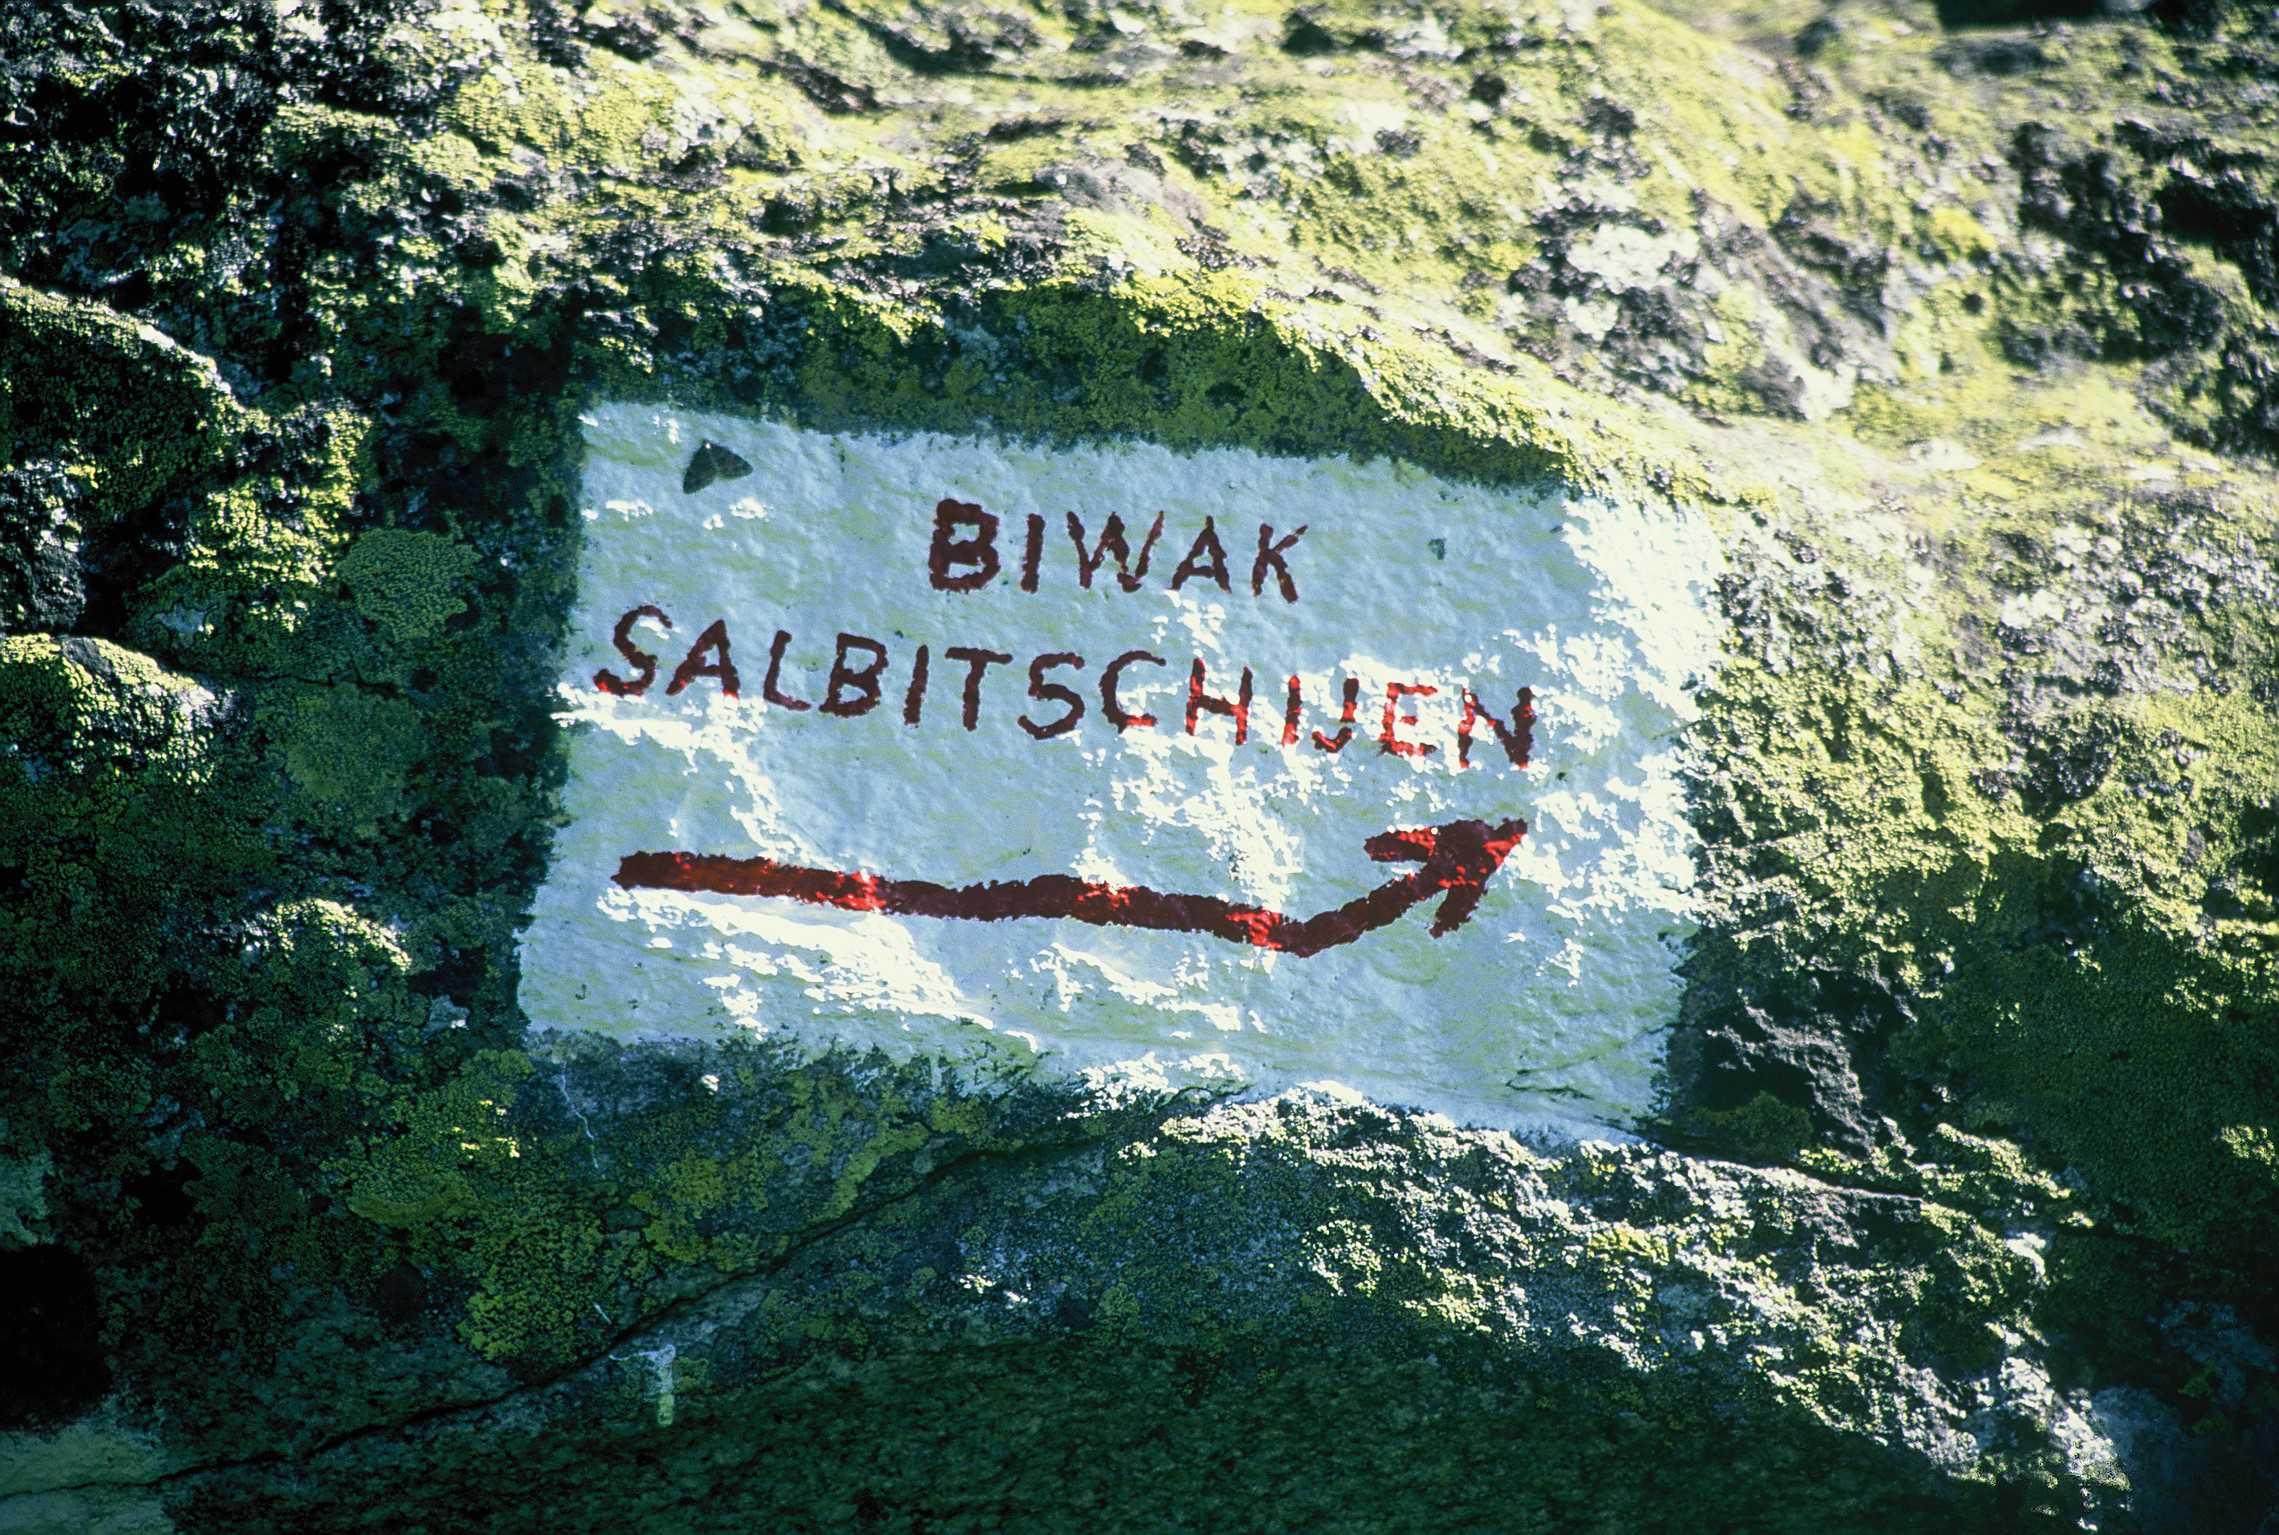 Via Hammerbruch am Salbitschijen